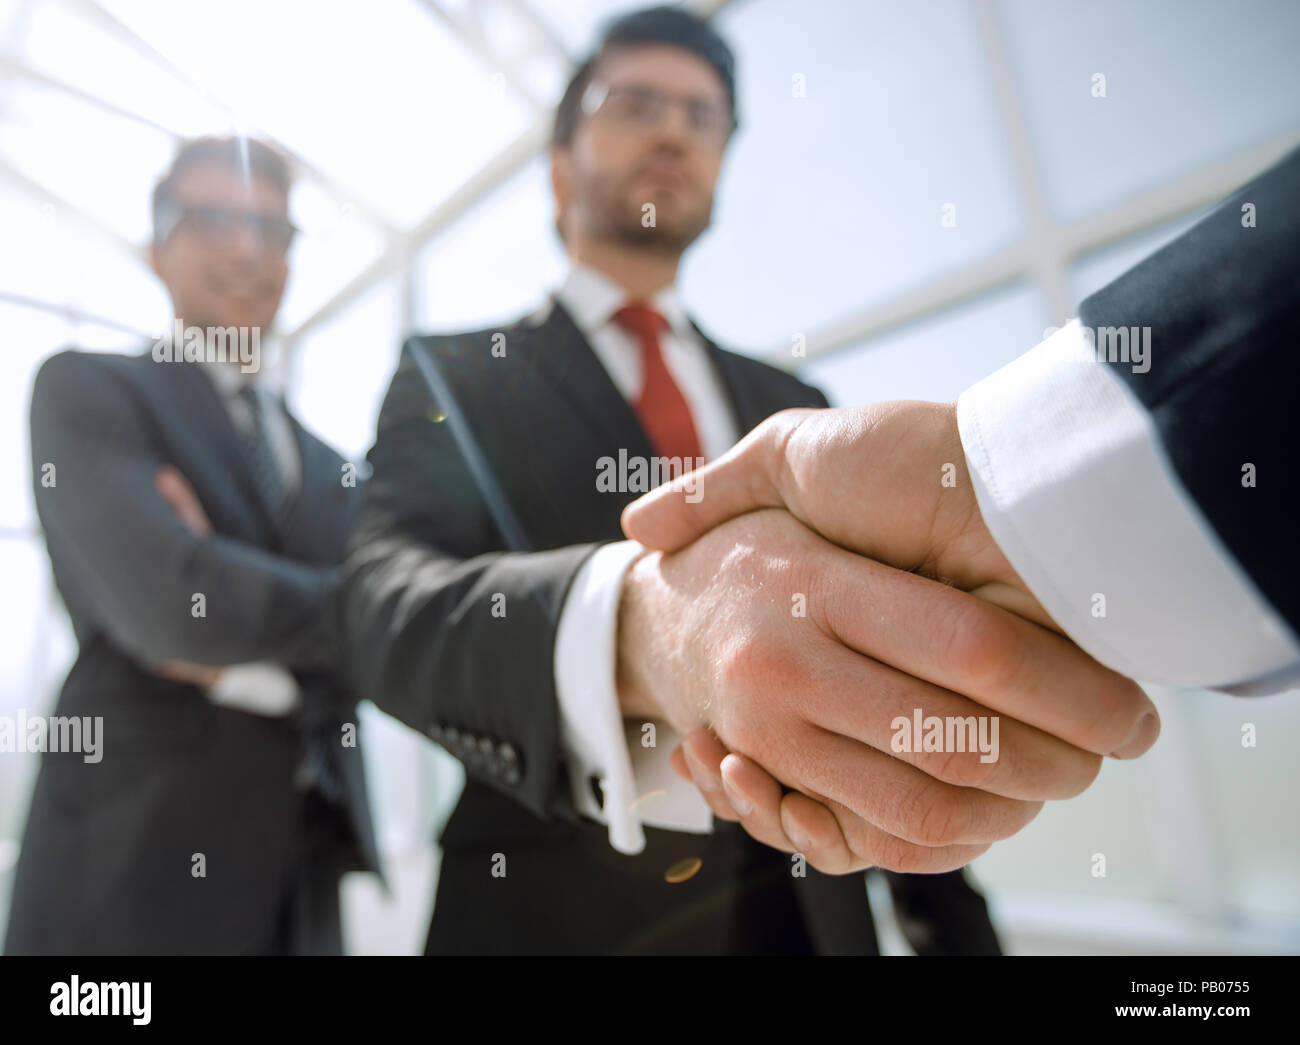 Fond d'affaires.business handshake Photo Stock